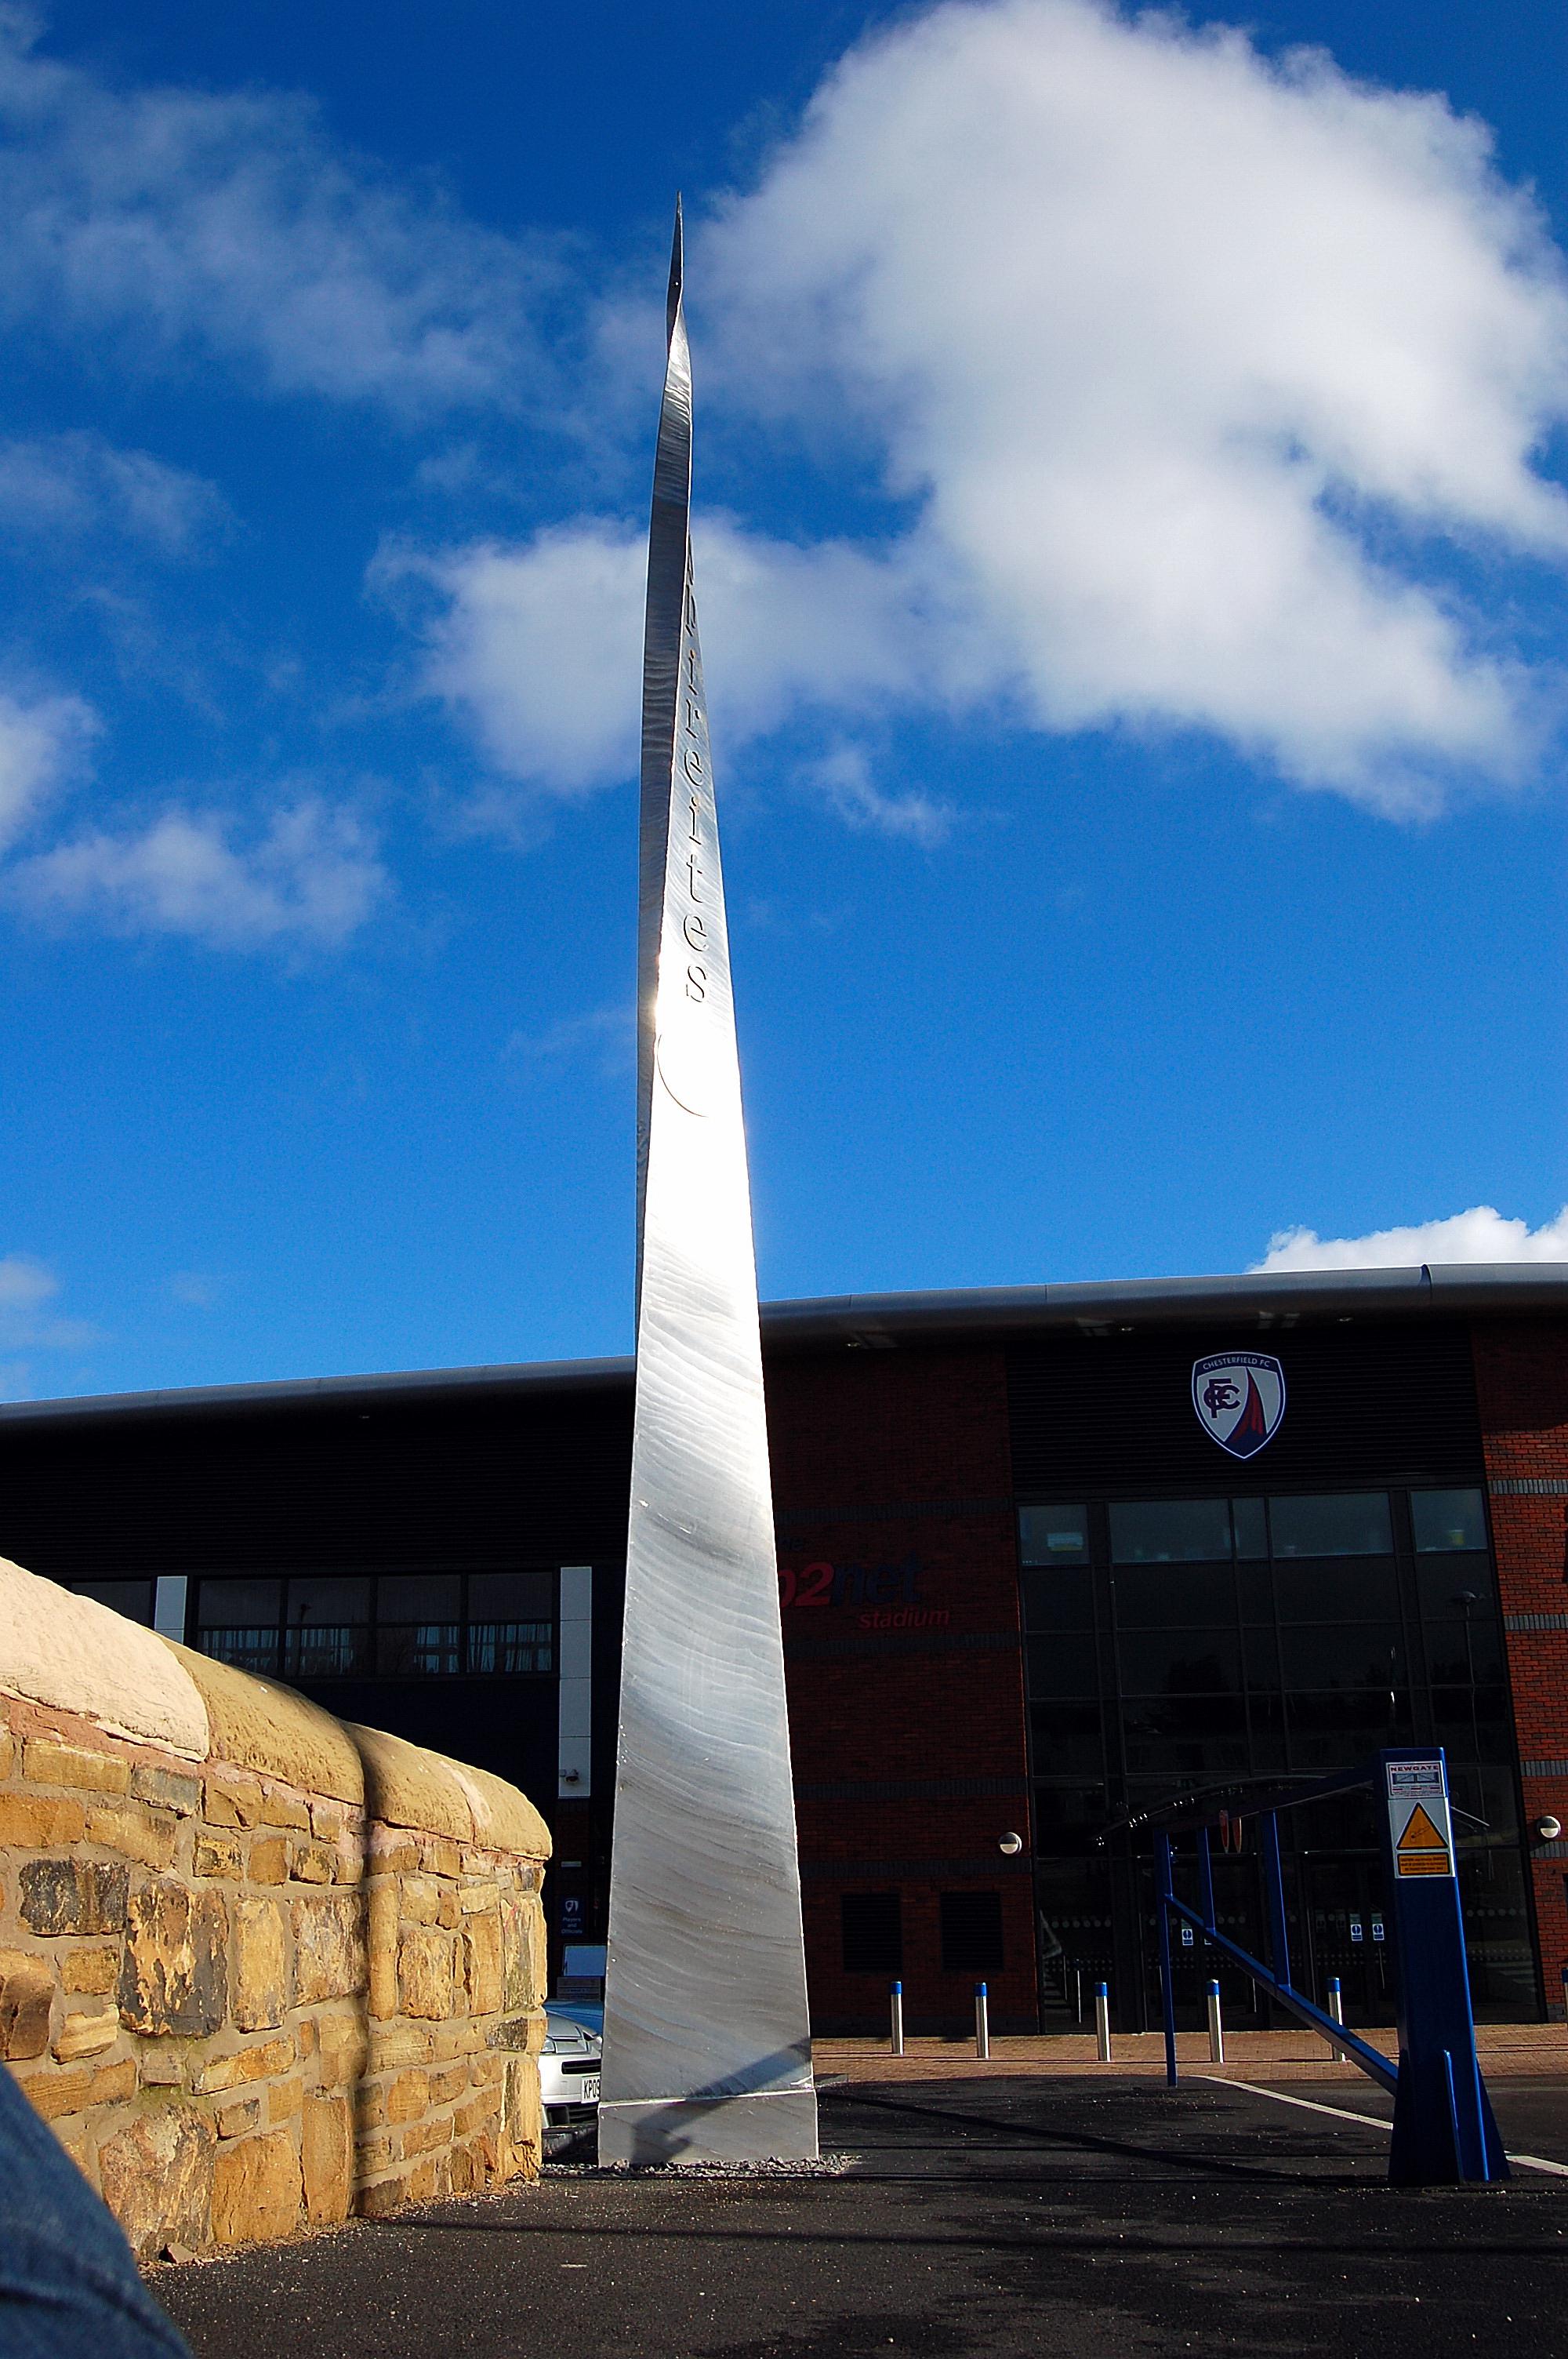 Spires - Chesterfield Football Club (8)